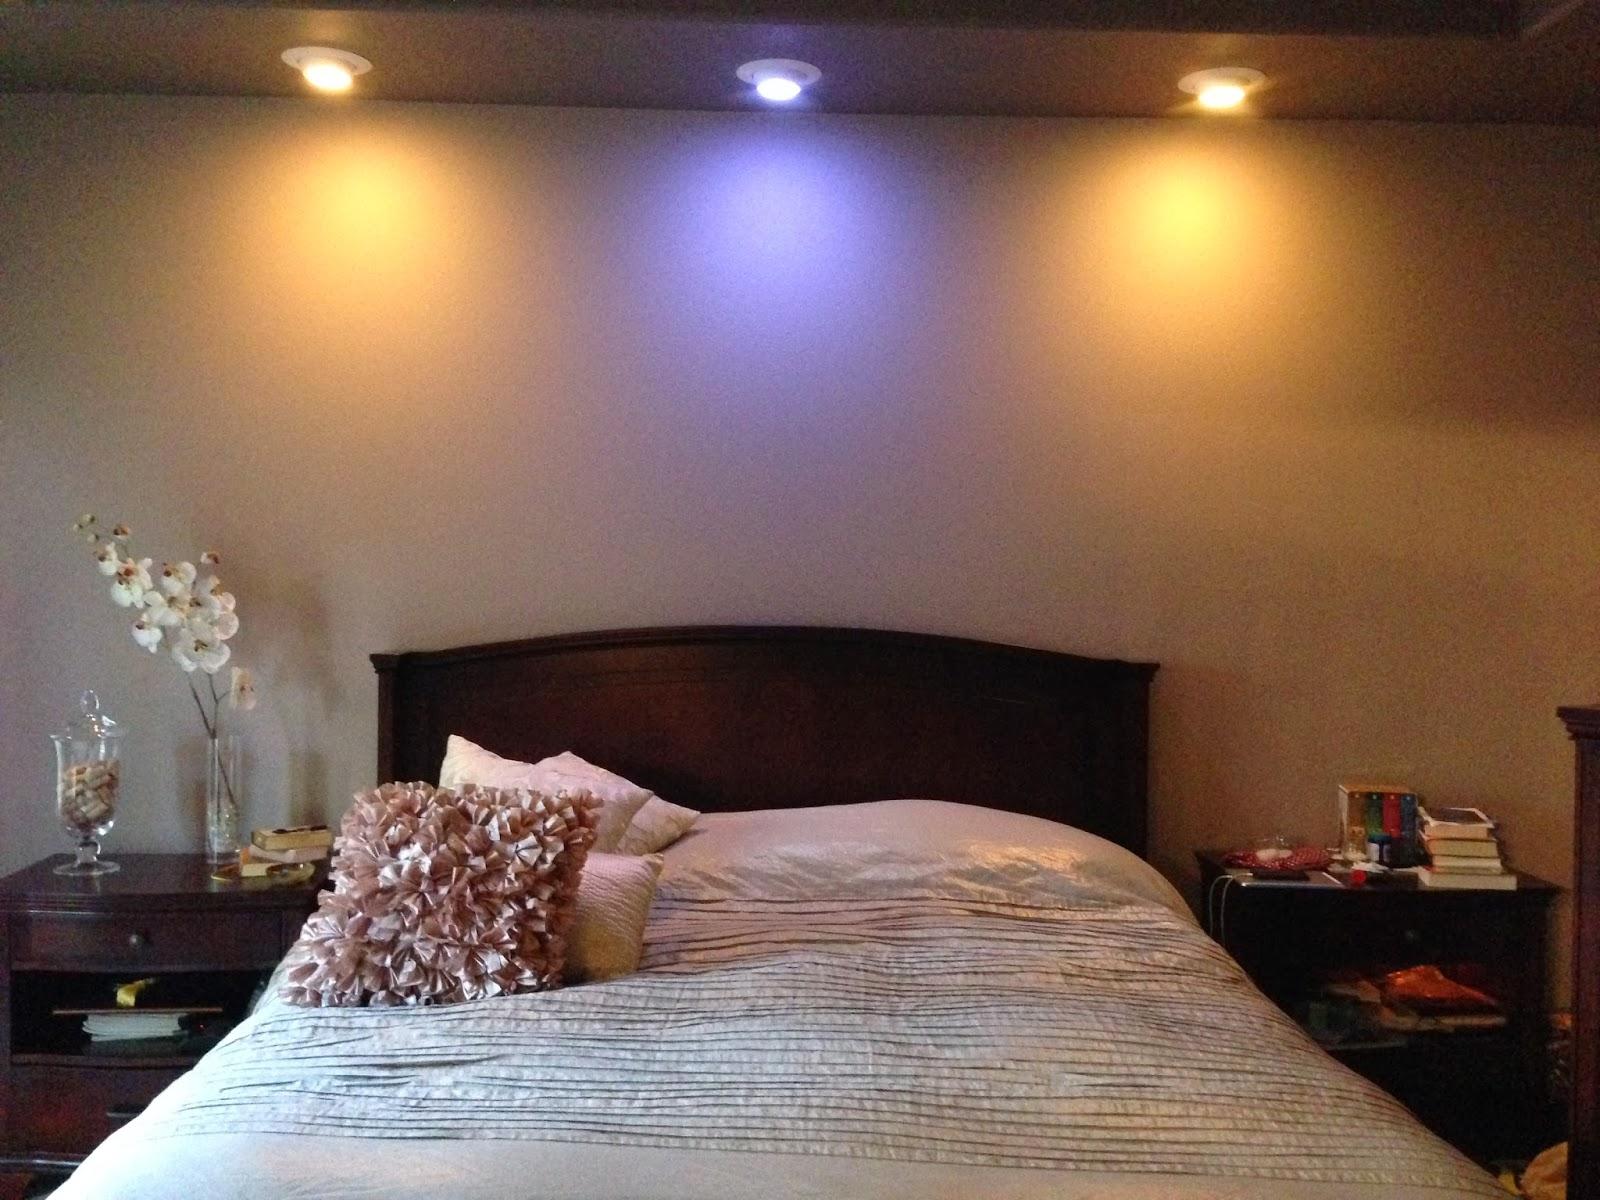 hue personal wireless lighting system